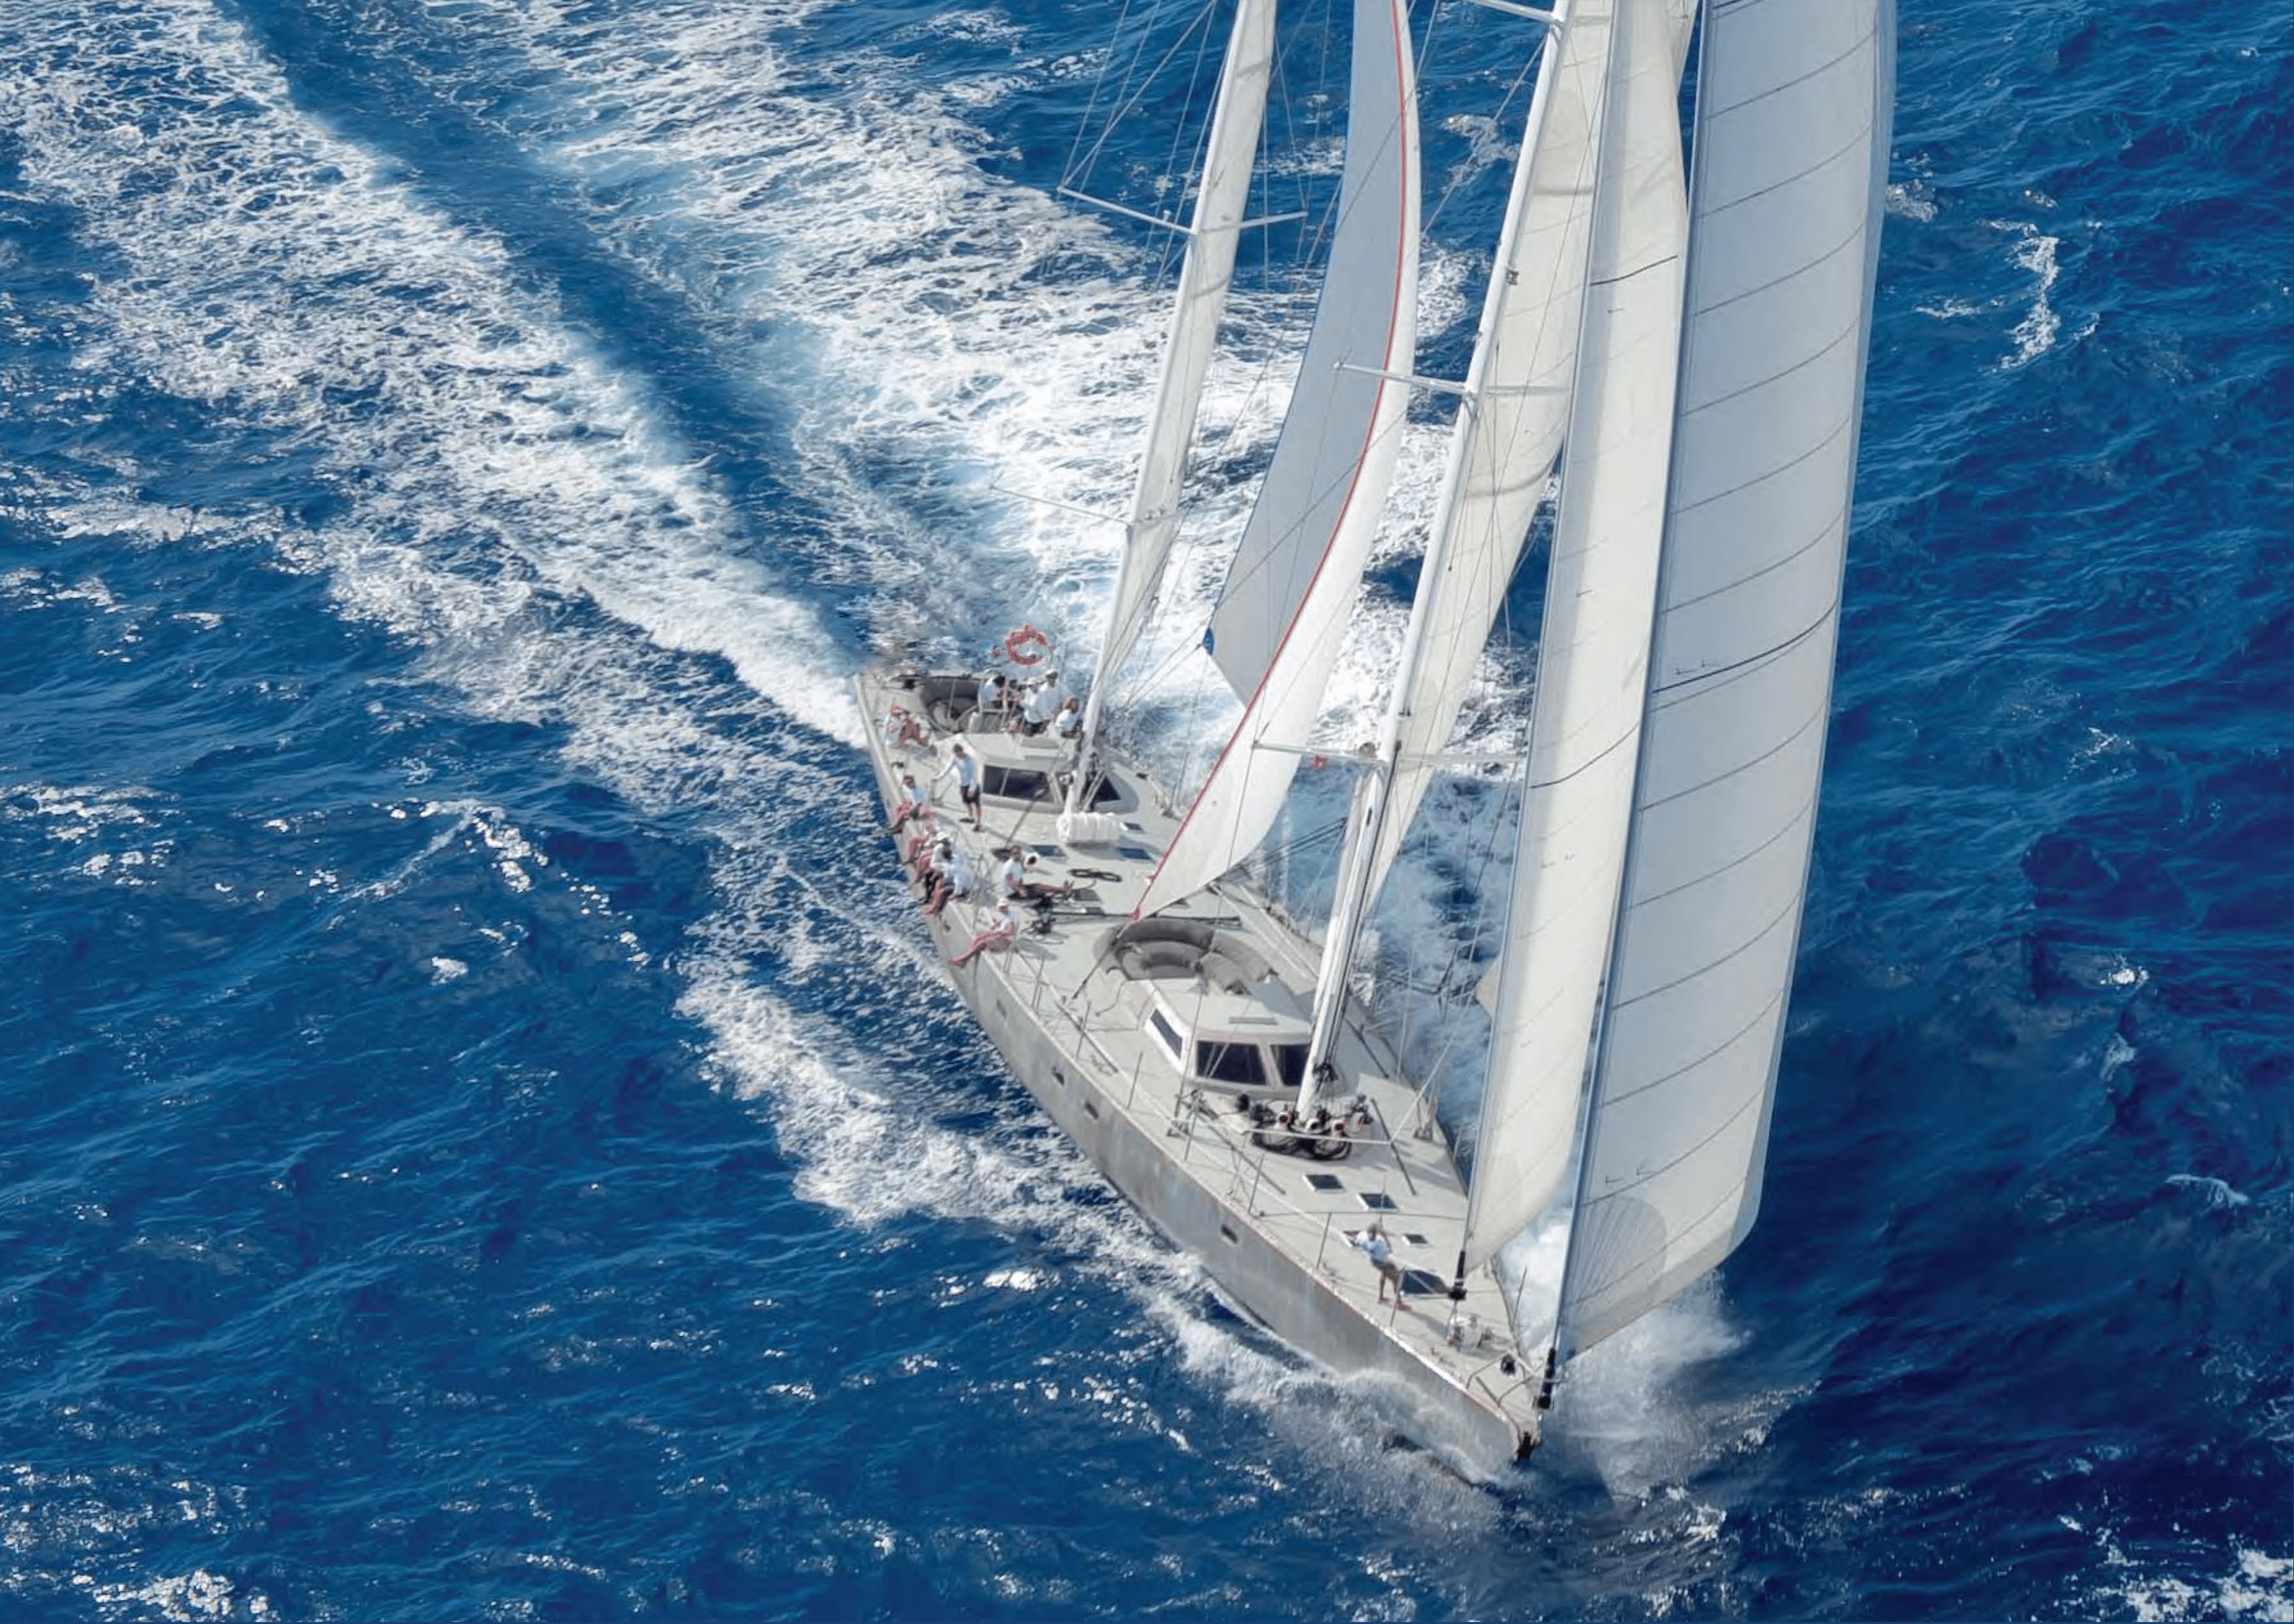 Expédition 7e Continent Naviguera à Bord Du Marama